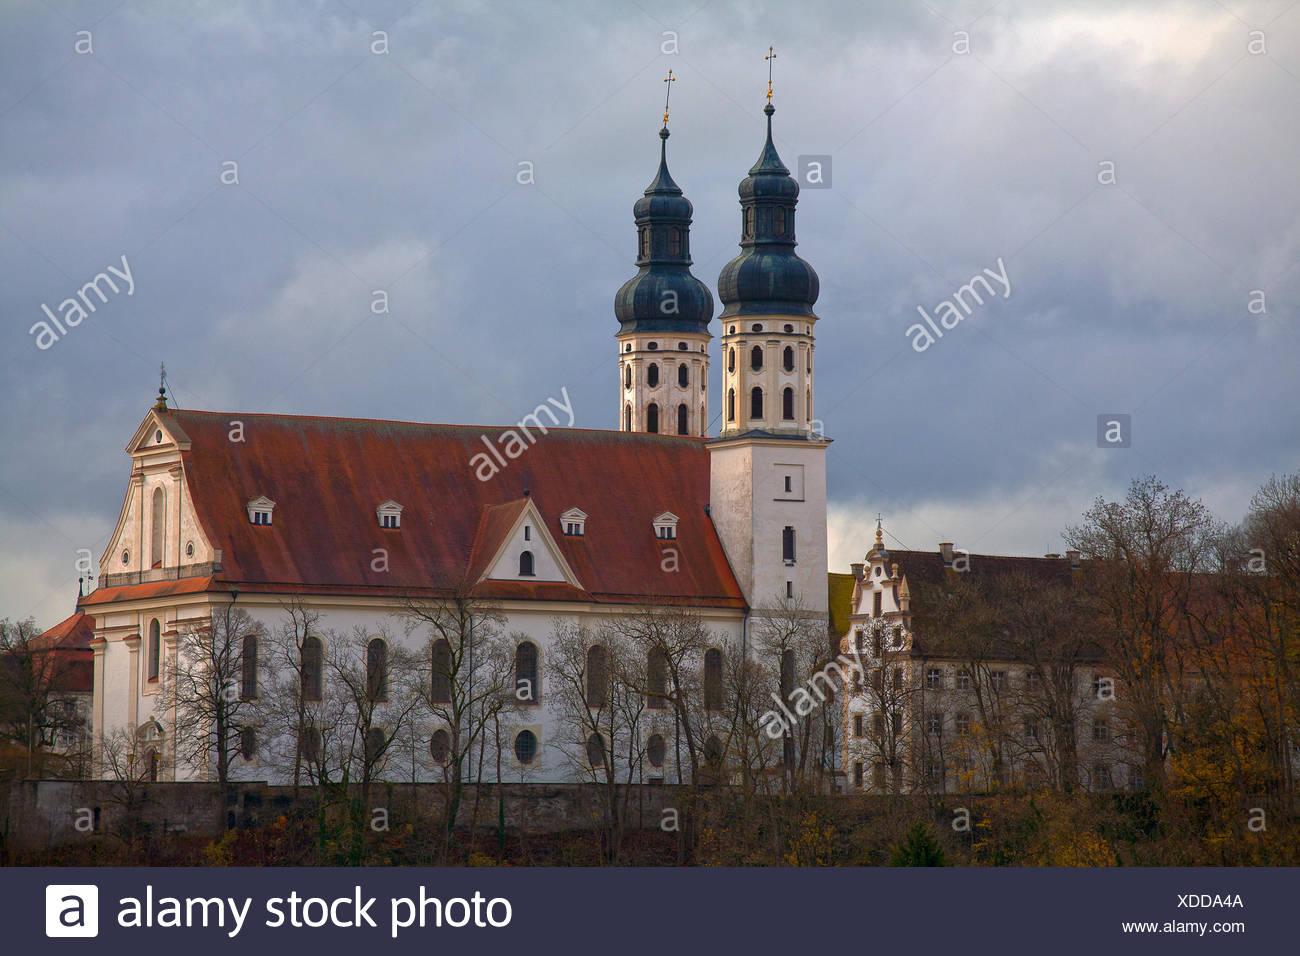 Monastary church Obermarchtal, Germany - Stock Image